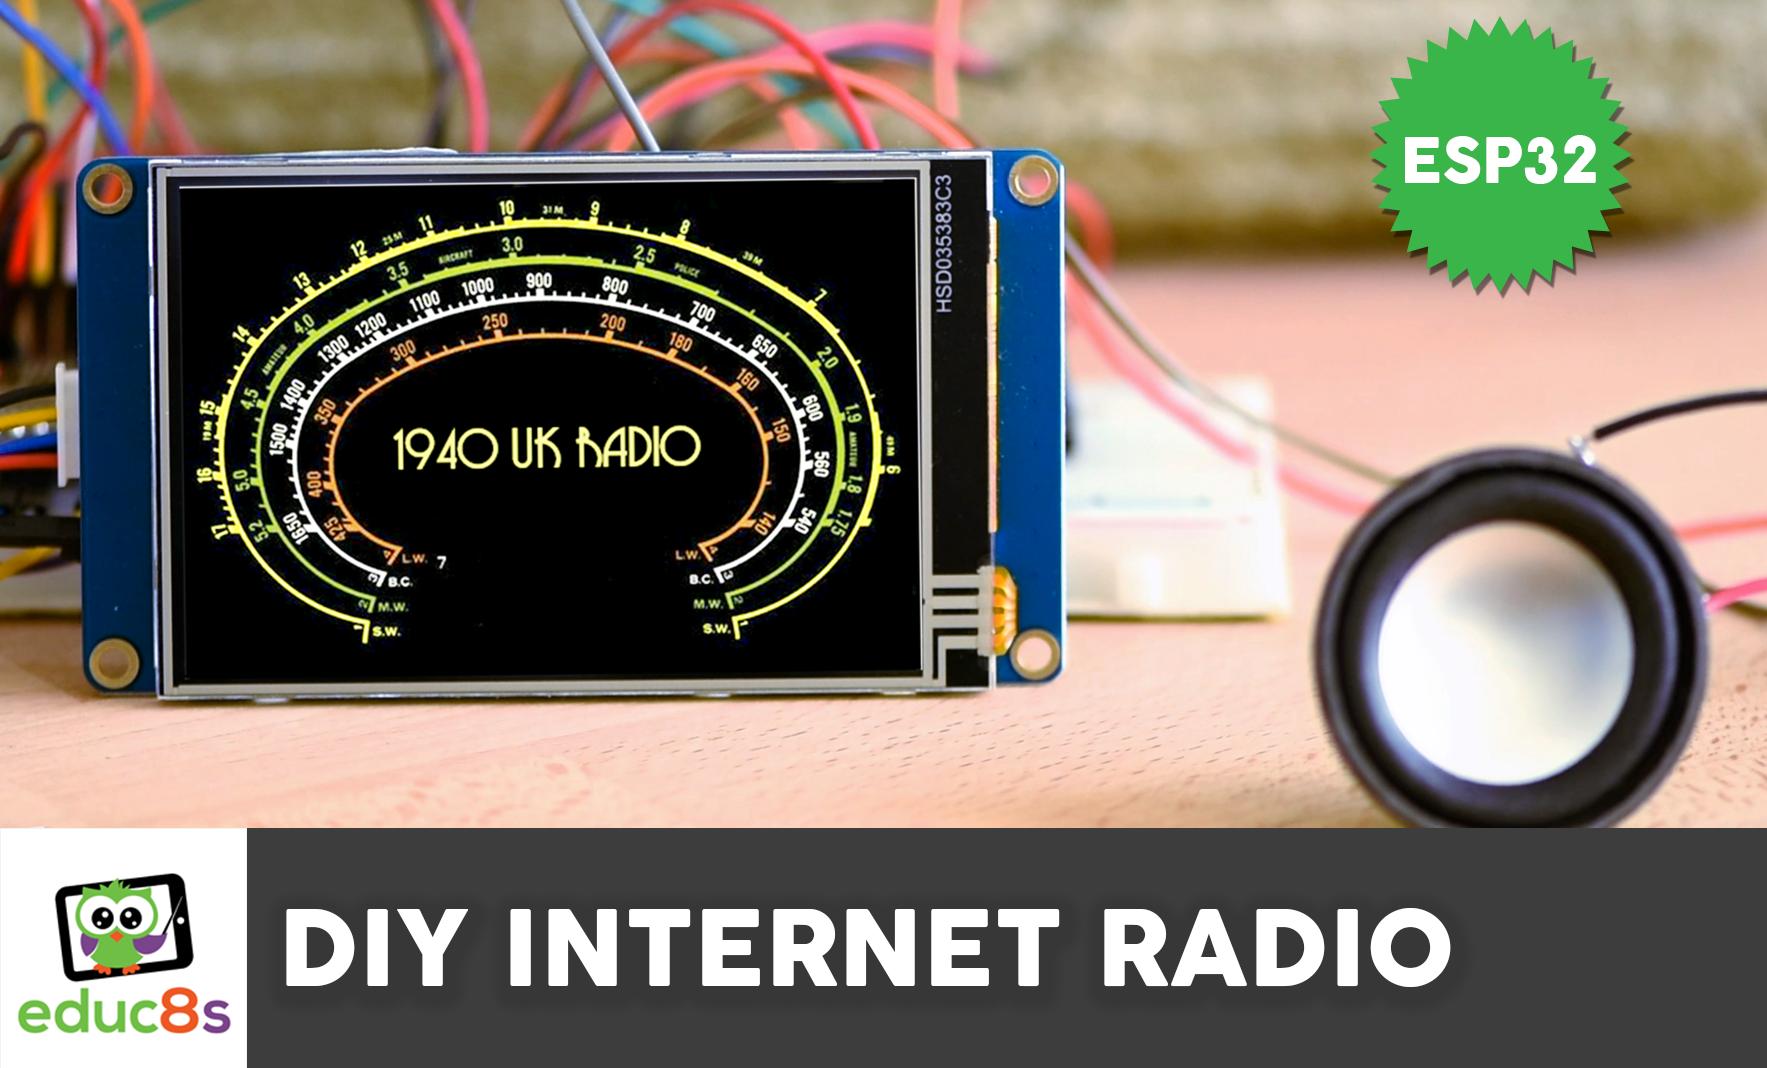 ESP32 Internet Radio - educ8s tv - Watch Learn Build